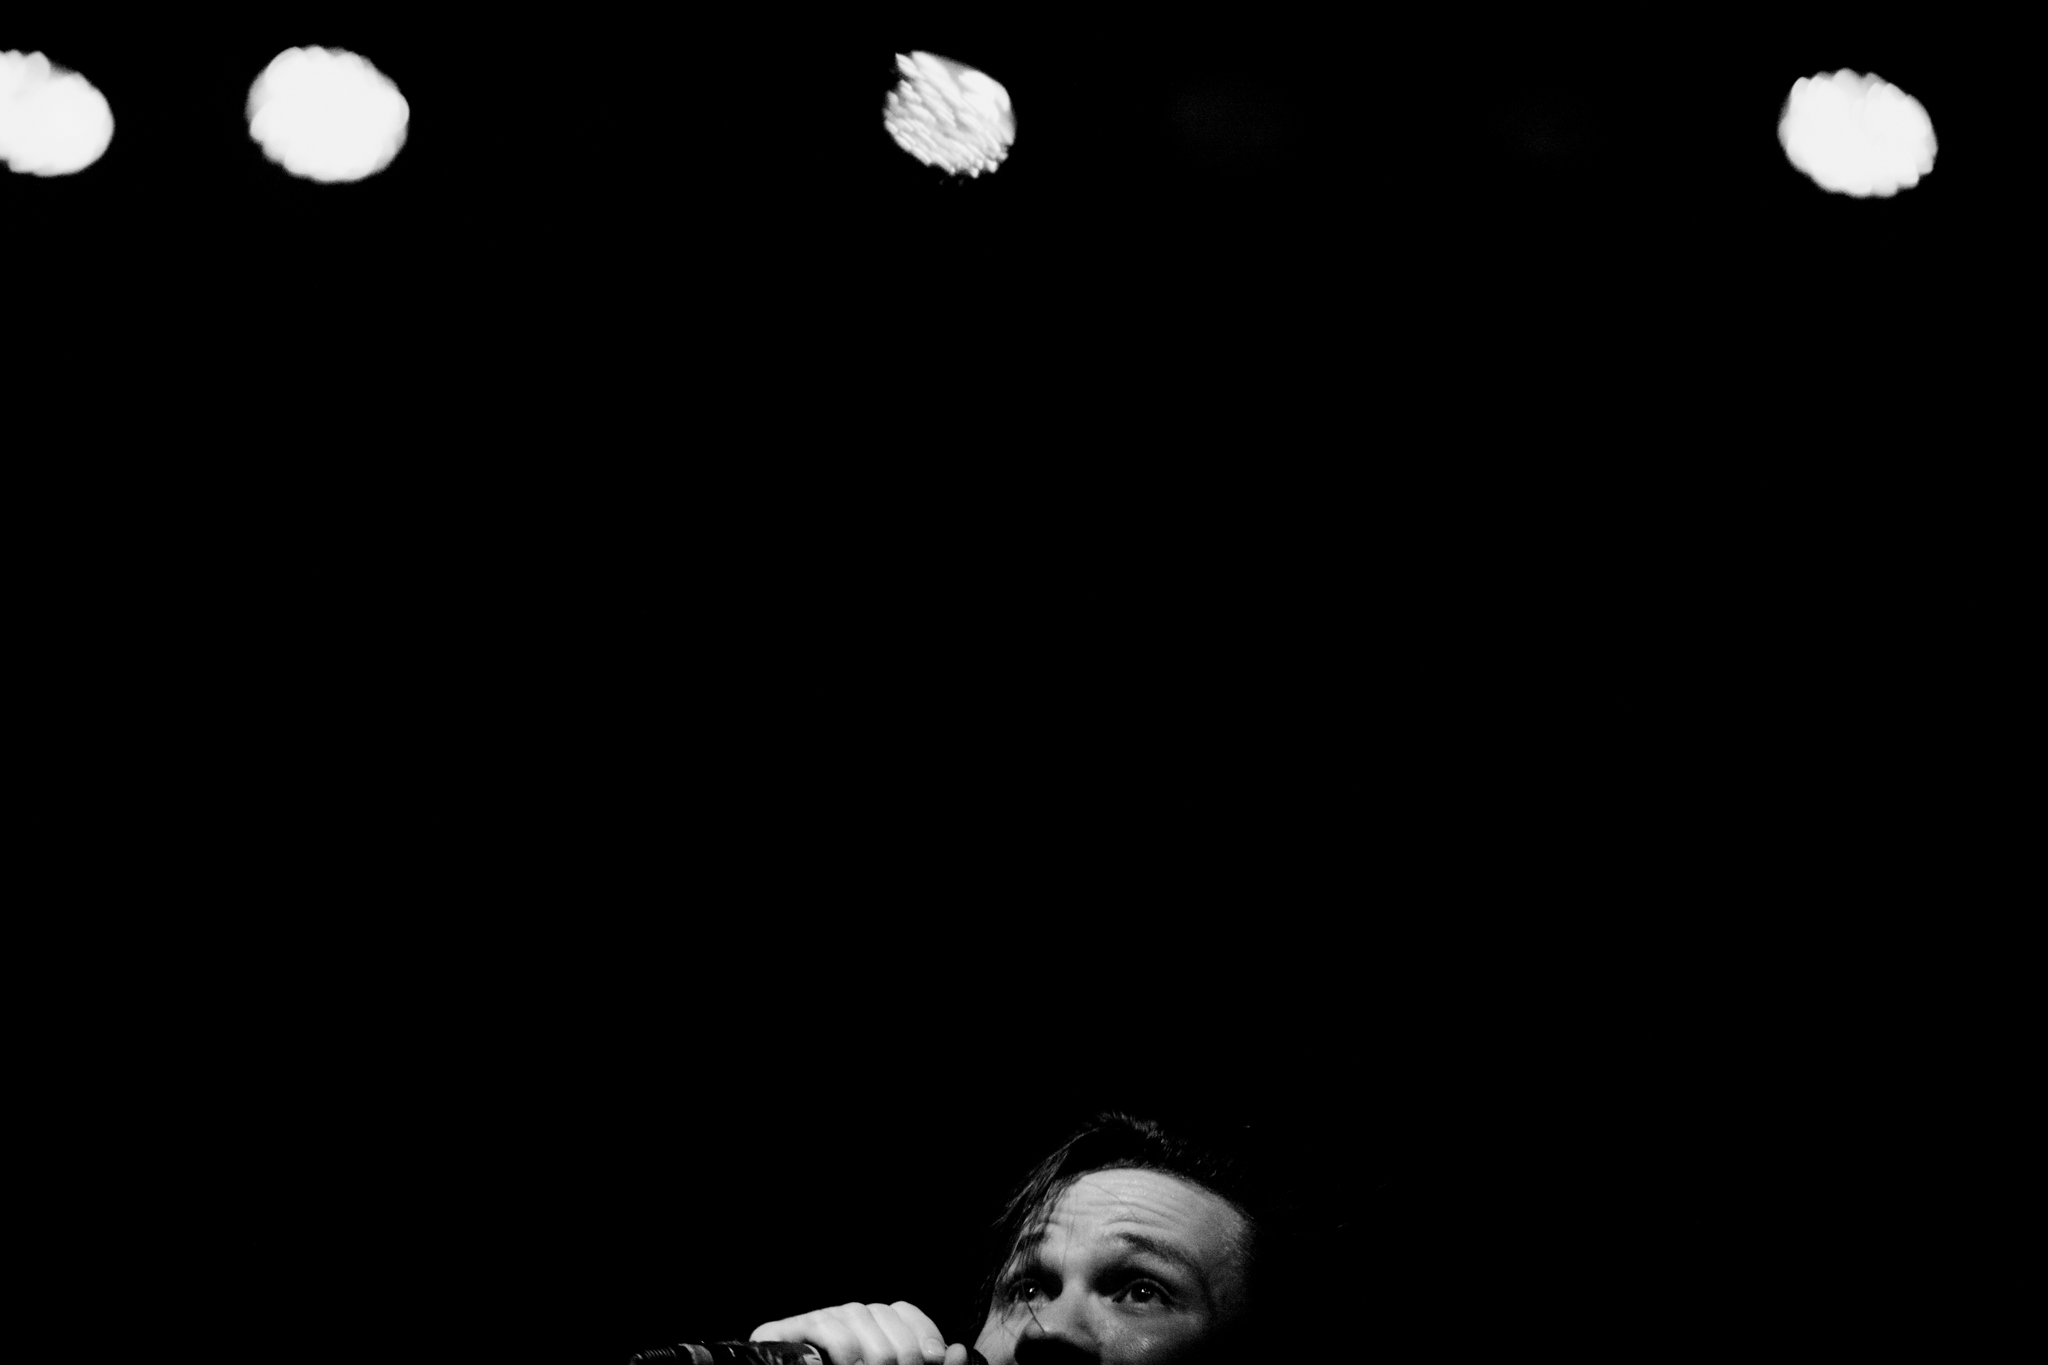 Lafferty Photo - Dance Gavin Dance 03.08.17-8391.jpg